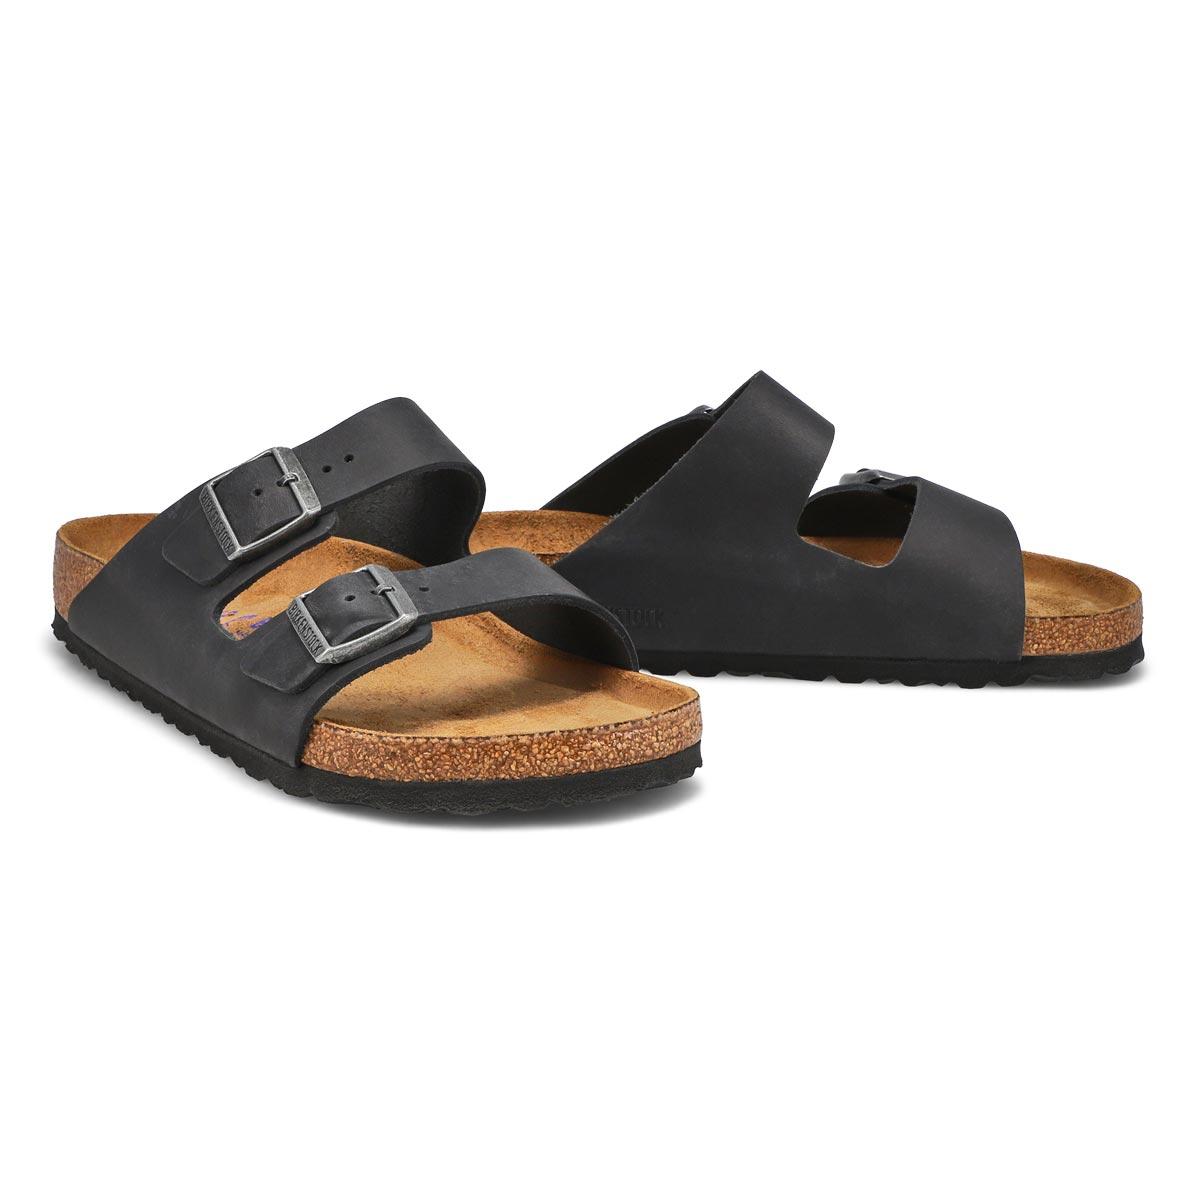 Lds Arizona blk 2 strap lthr sandal SF